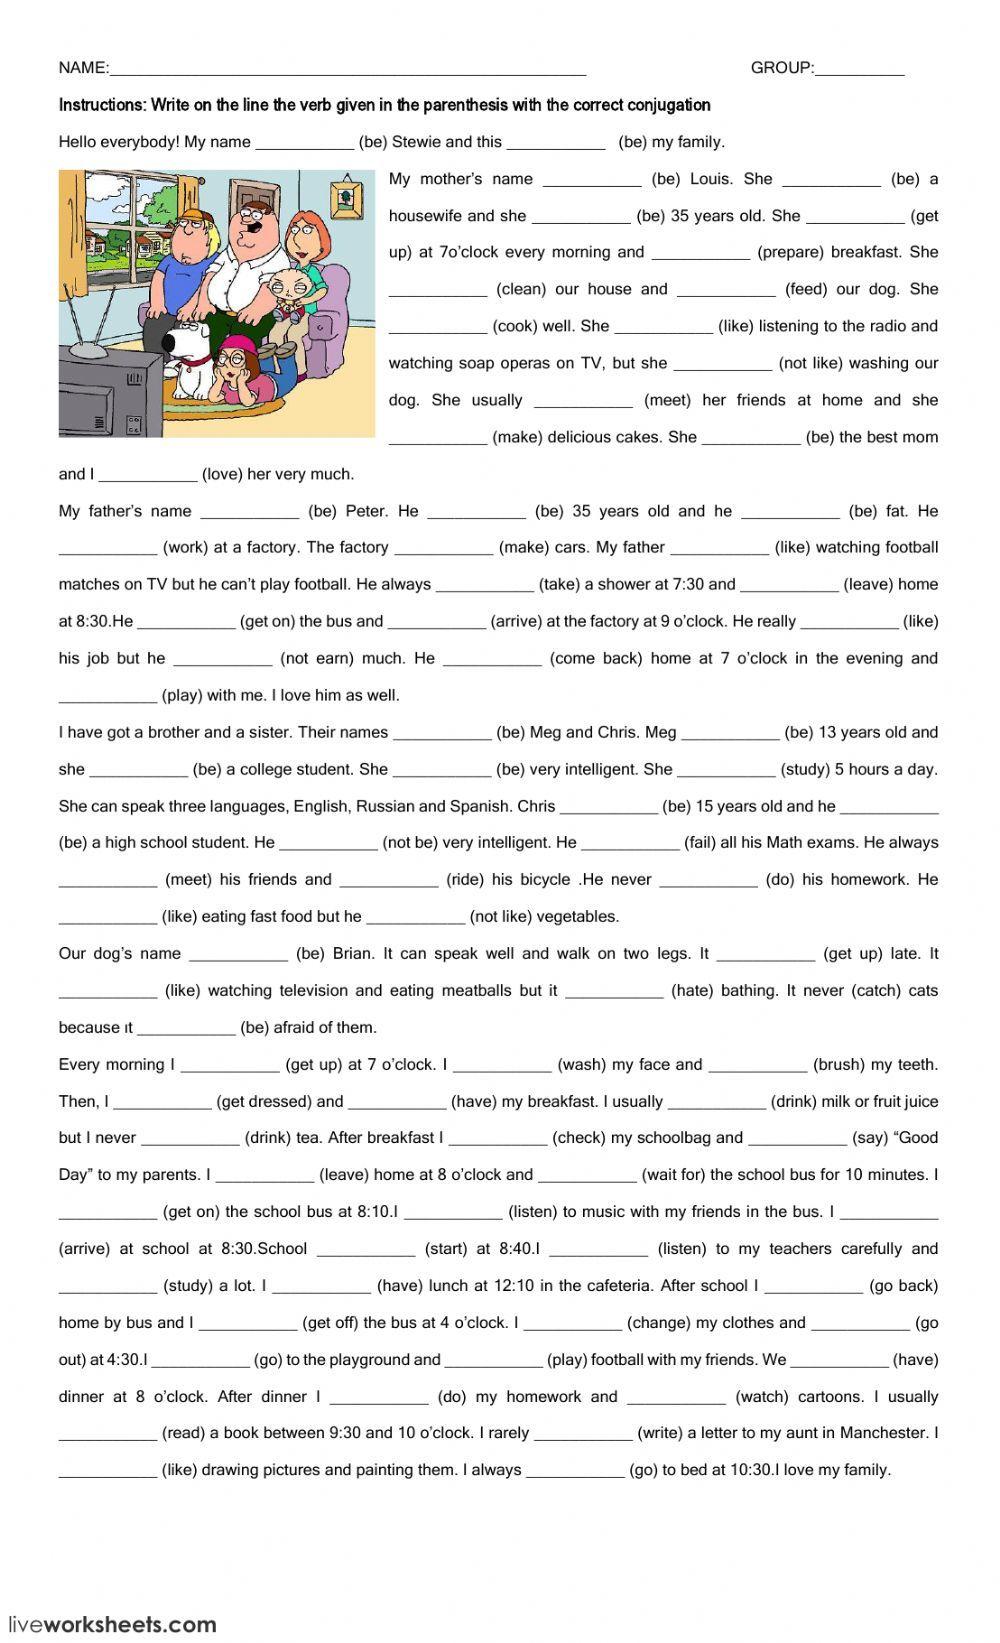 Present Simple Interactive Worksheet By Zugarplum English Writing Skills Teaching English Grammar English Grammar Worksheets [ 1643 x 1000 Pixel ]